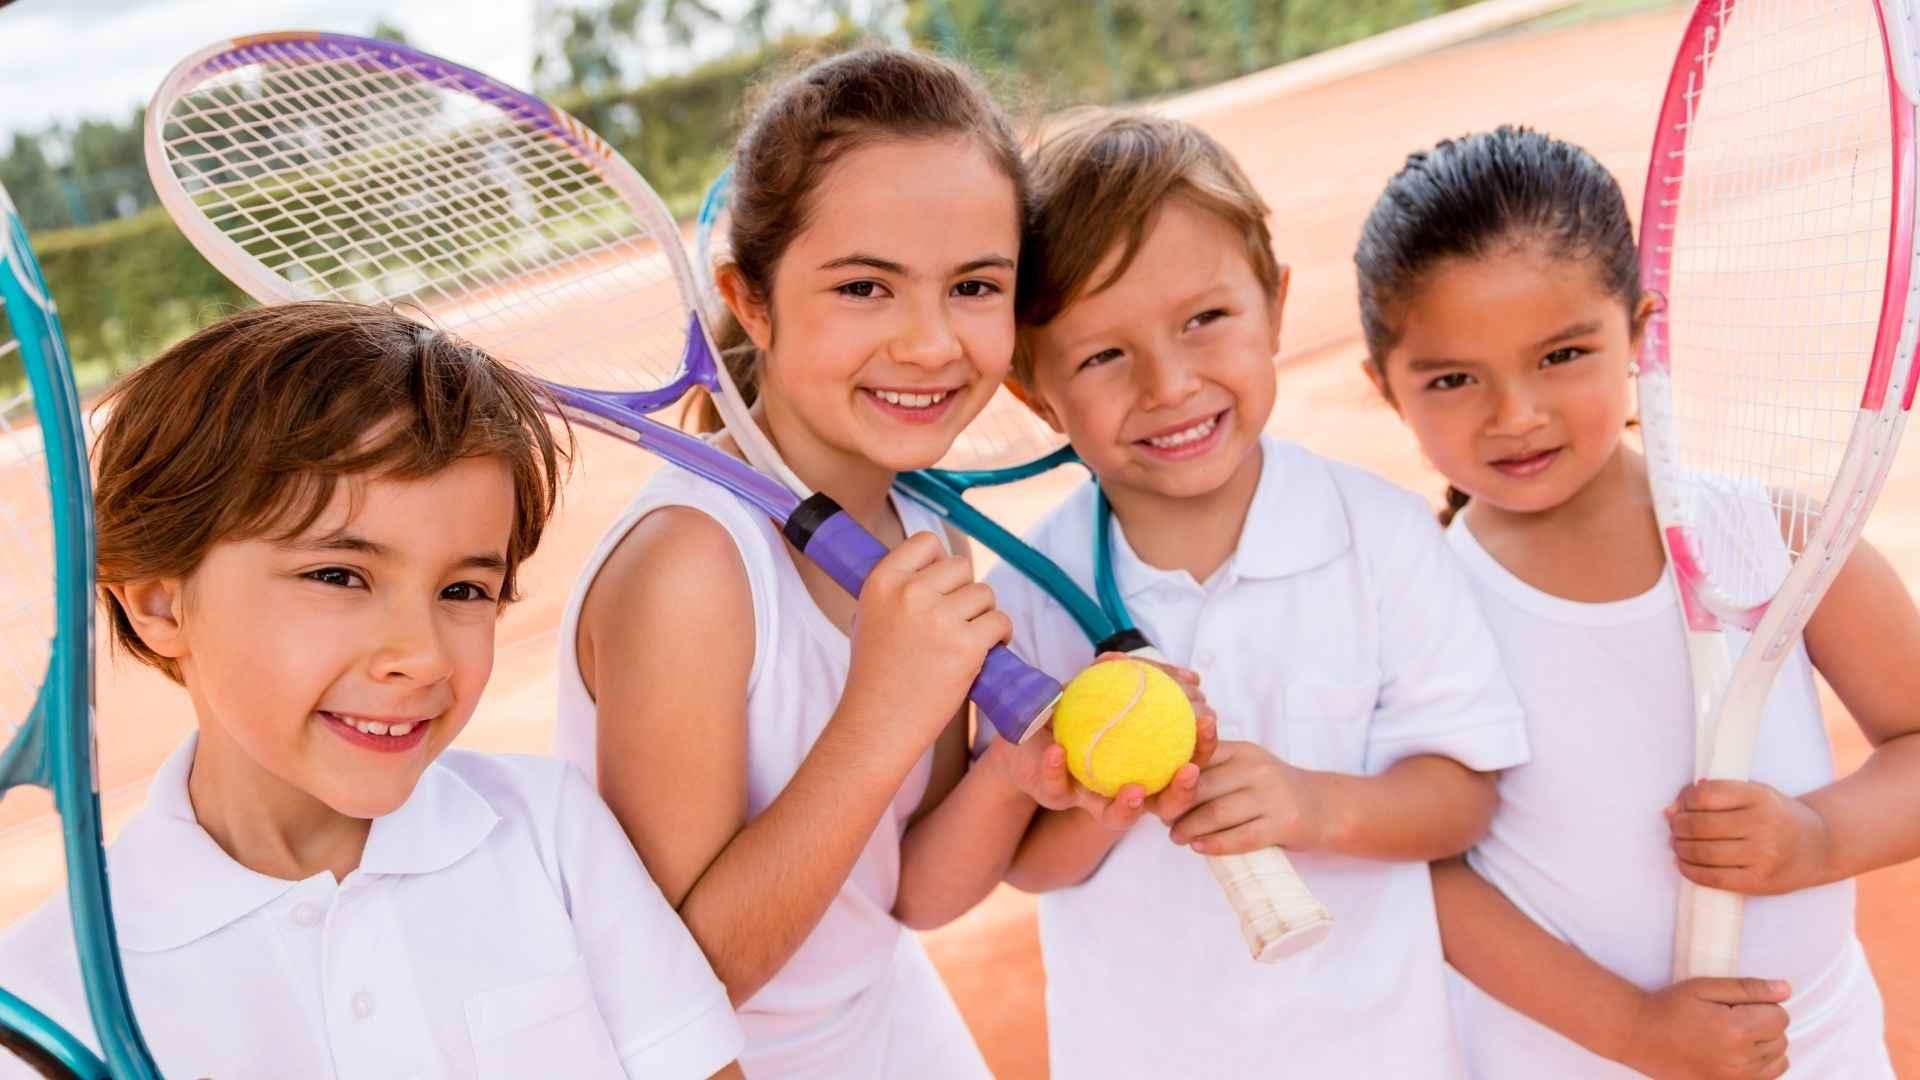 Mandurah Tennis Club - School Holiday Clinics